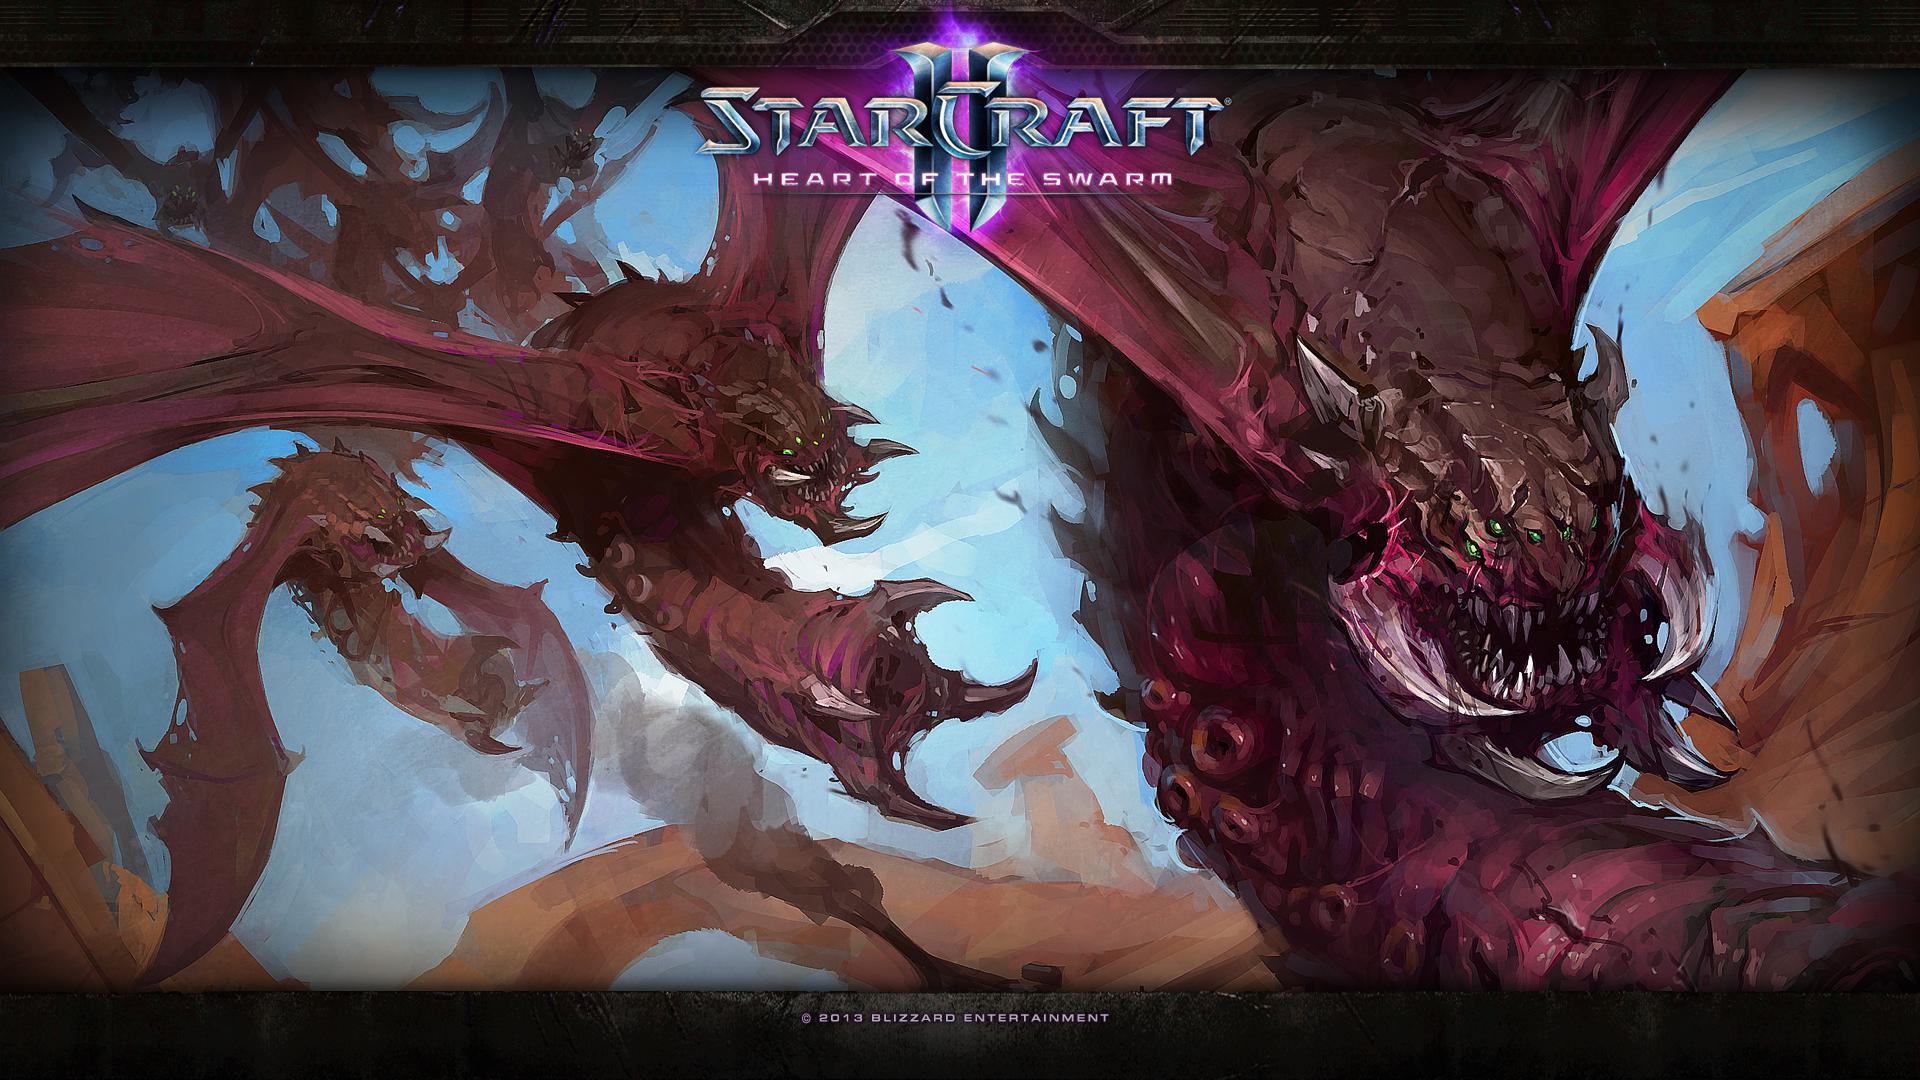 Starcraft 2 Heart of the Swarm wallpaper 8